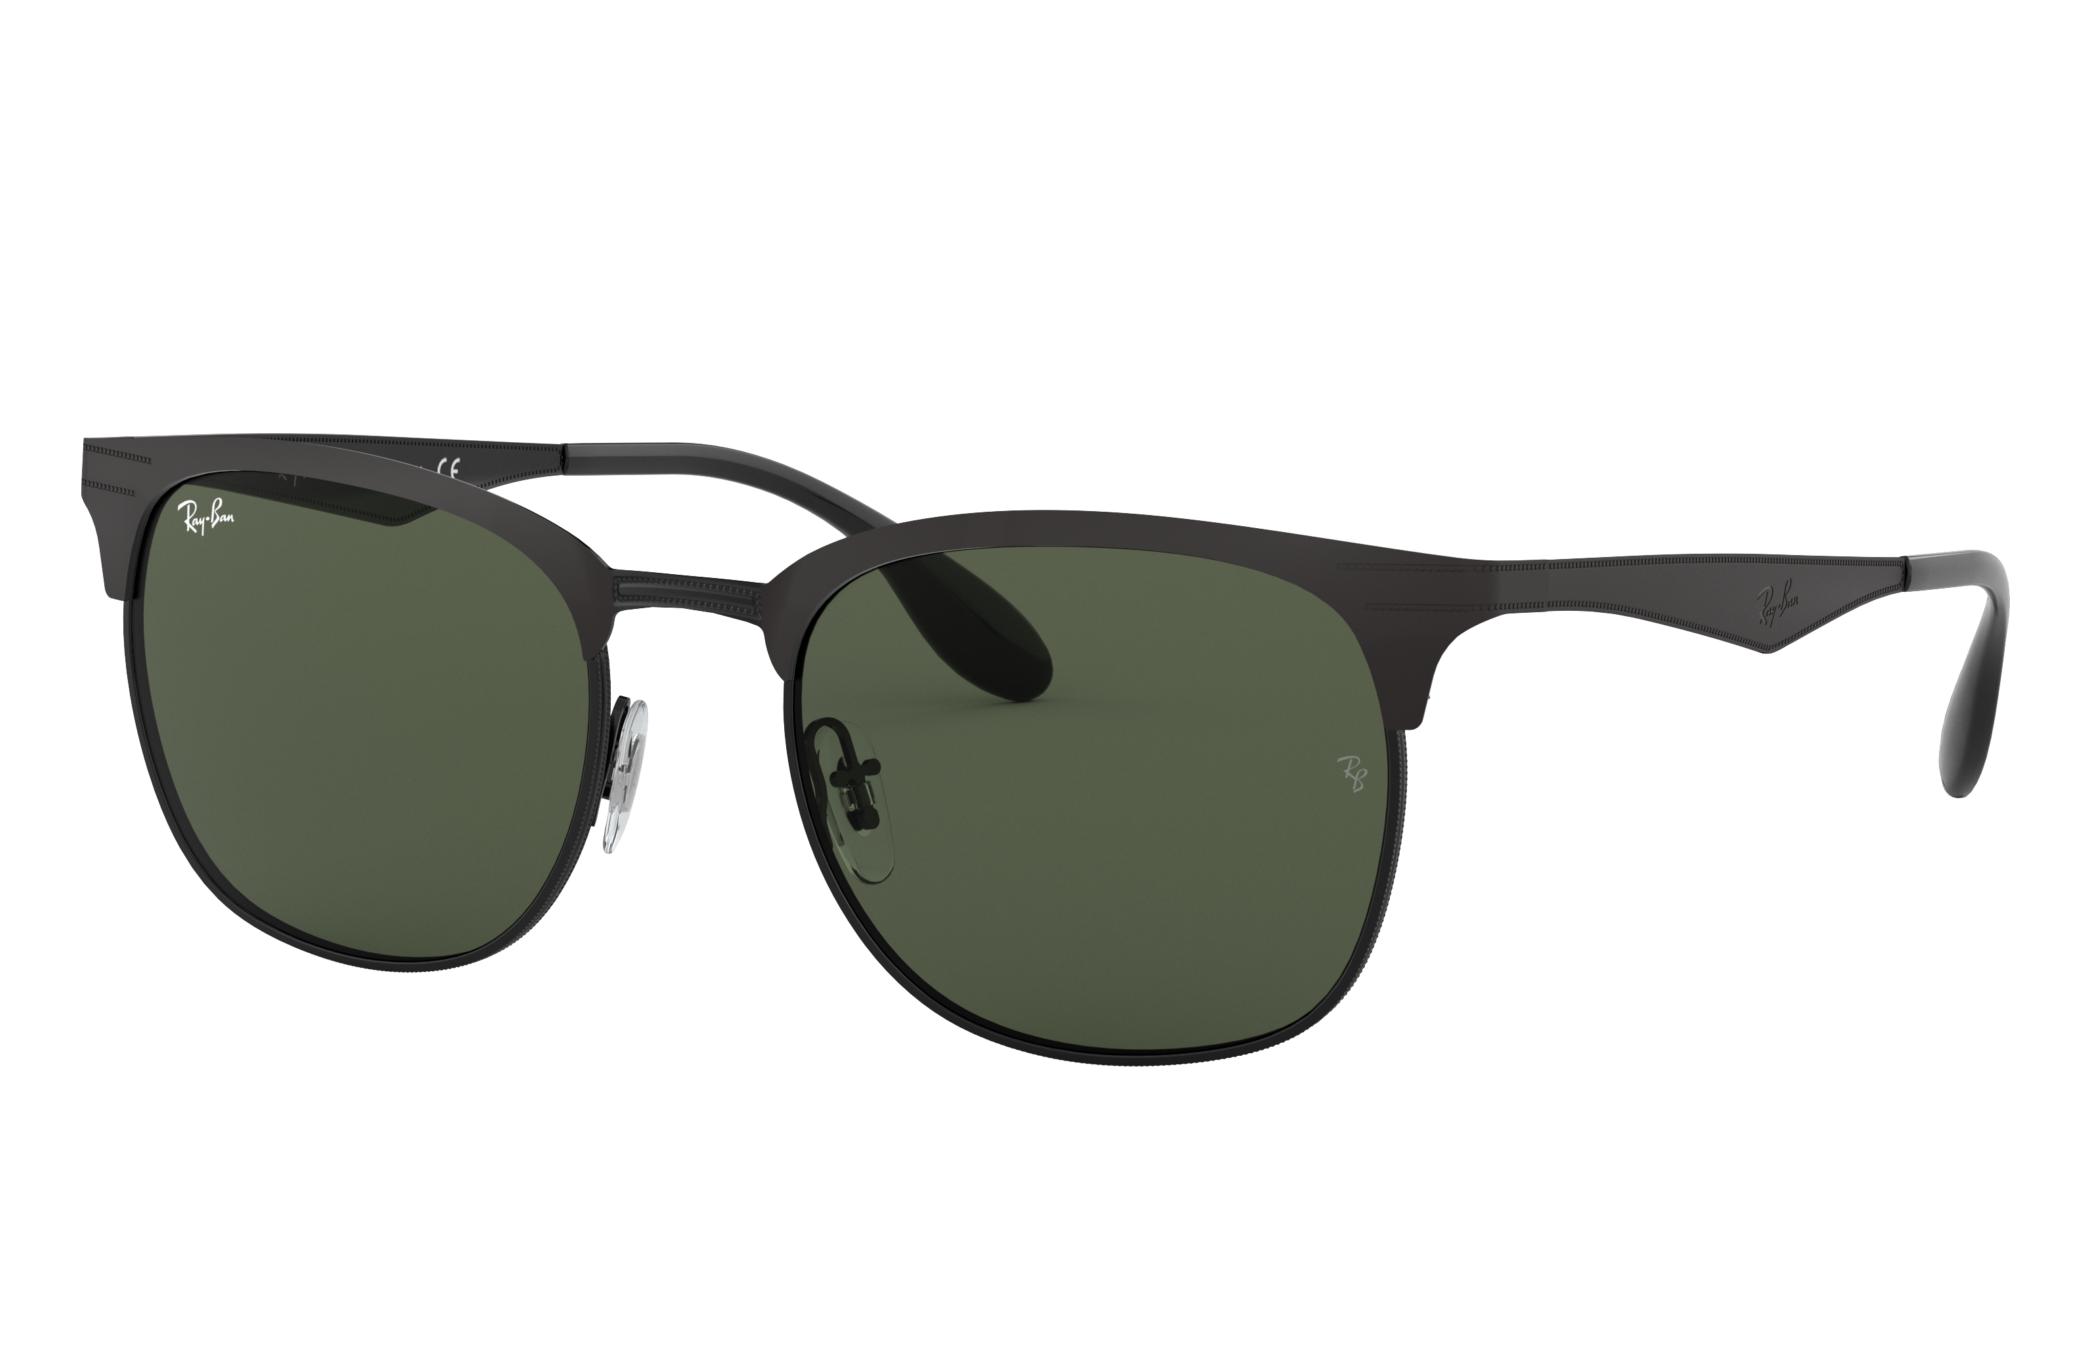 Ray-Ban Rb3538 Black, Green Lenses - RB3538